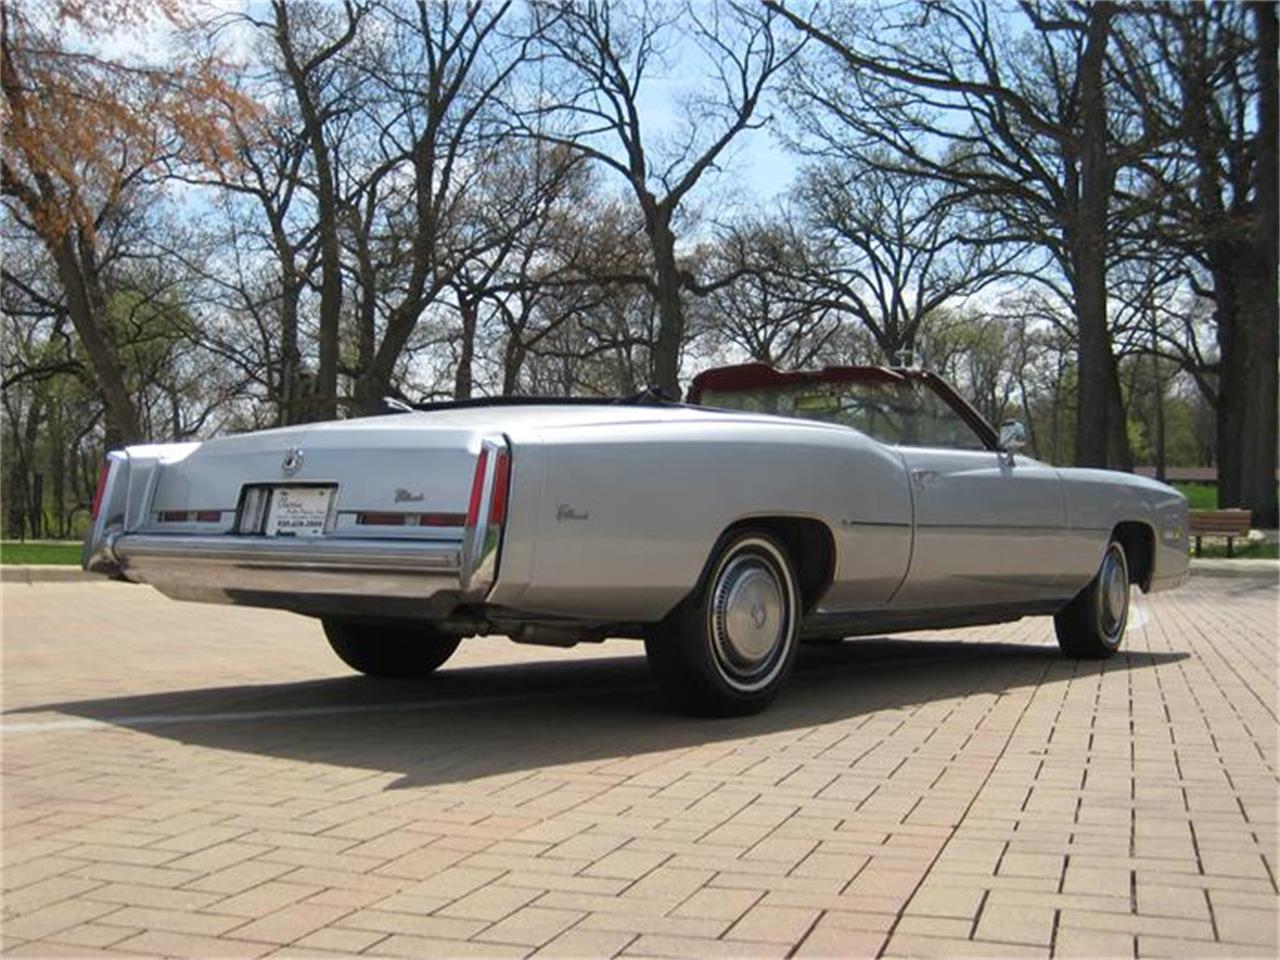 Large Picture of 1975 Cadillac Eldorado located in Geneva Illinois - $12,995.00 - E9SK